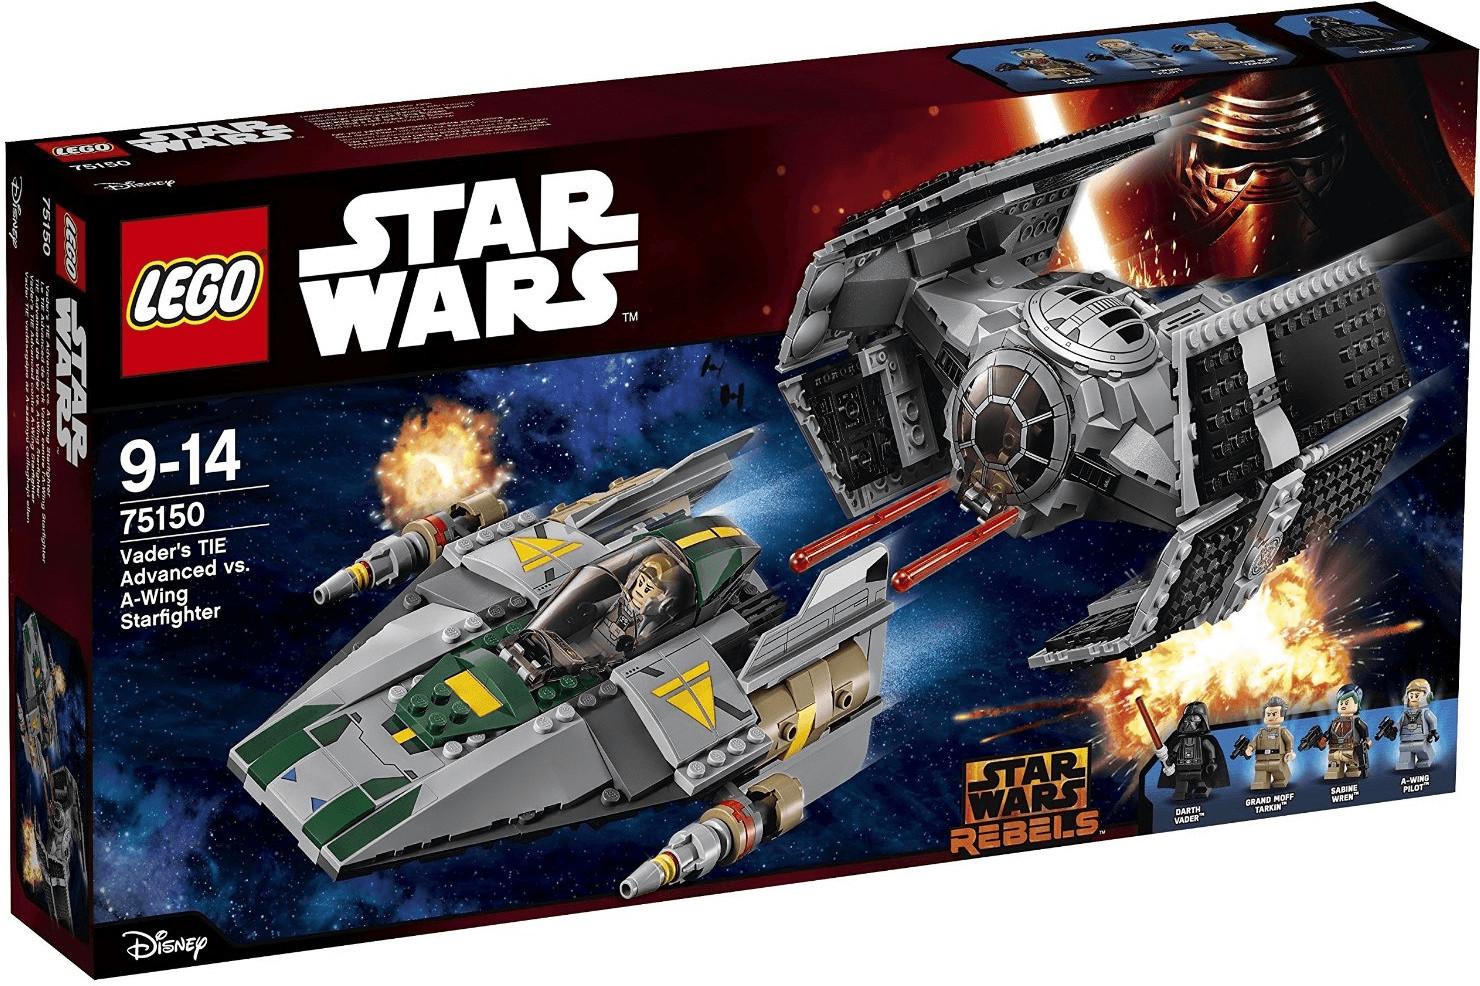 LEGO Star Wars - Le TIE Advanced de Dark Vador contre l'A-Wing Starfighter (75150)